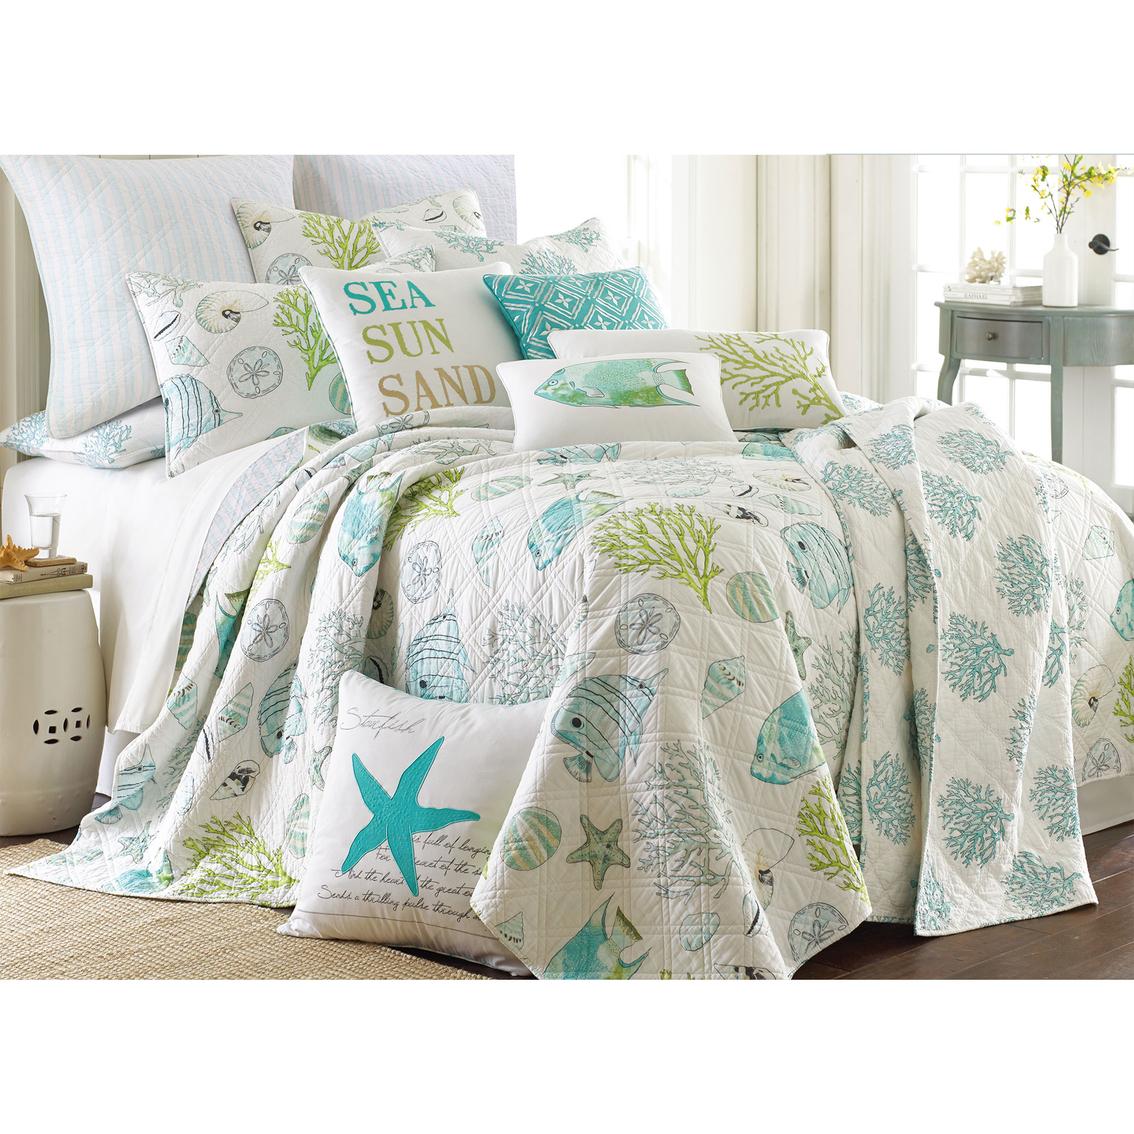 Levtex Home Biscayne Quilt Set Bedding Sets Household Shop The Exchange